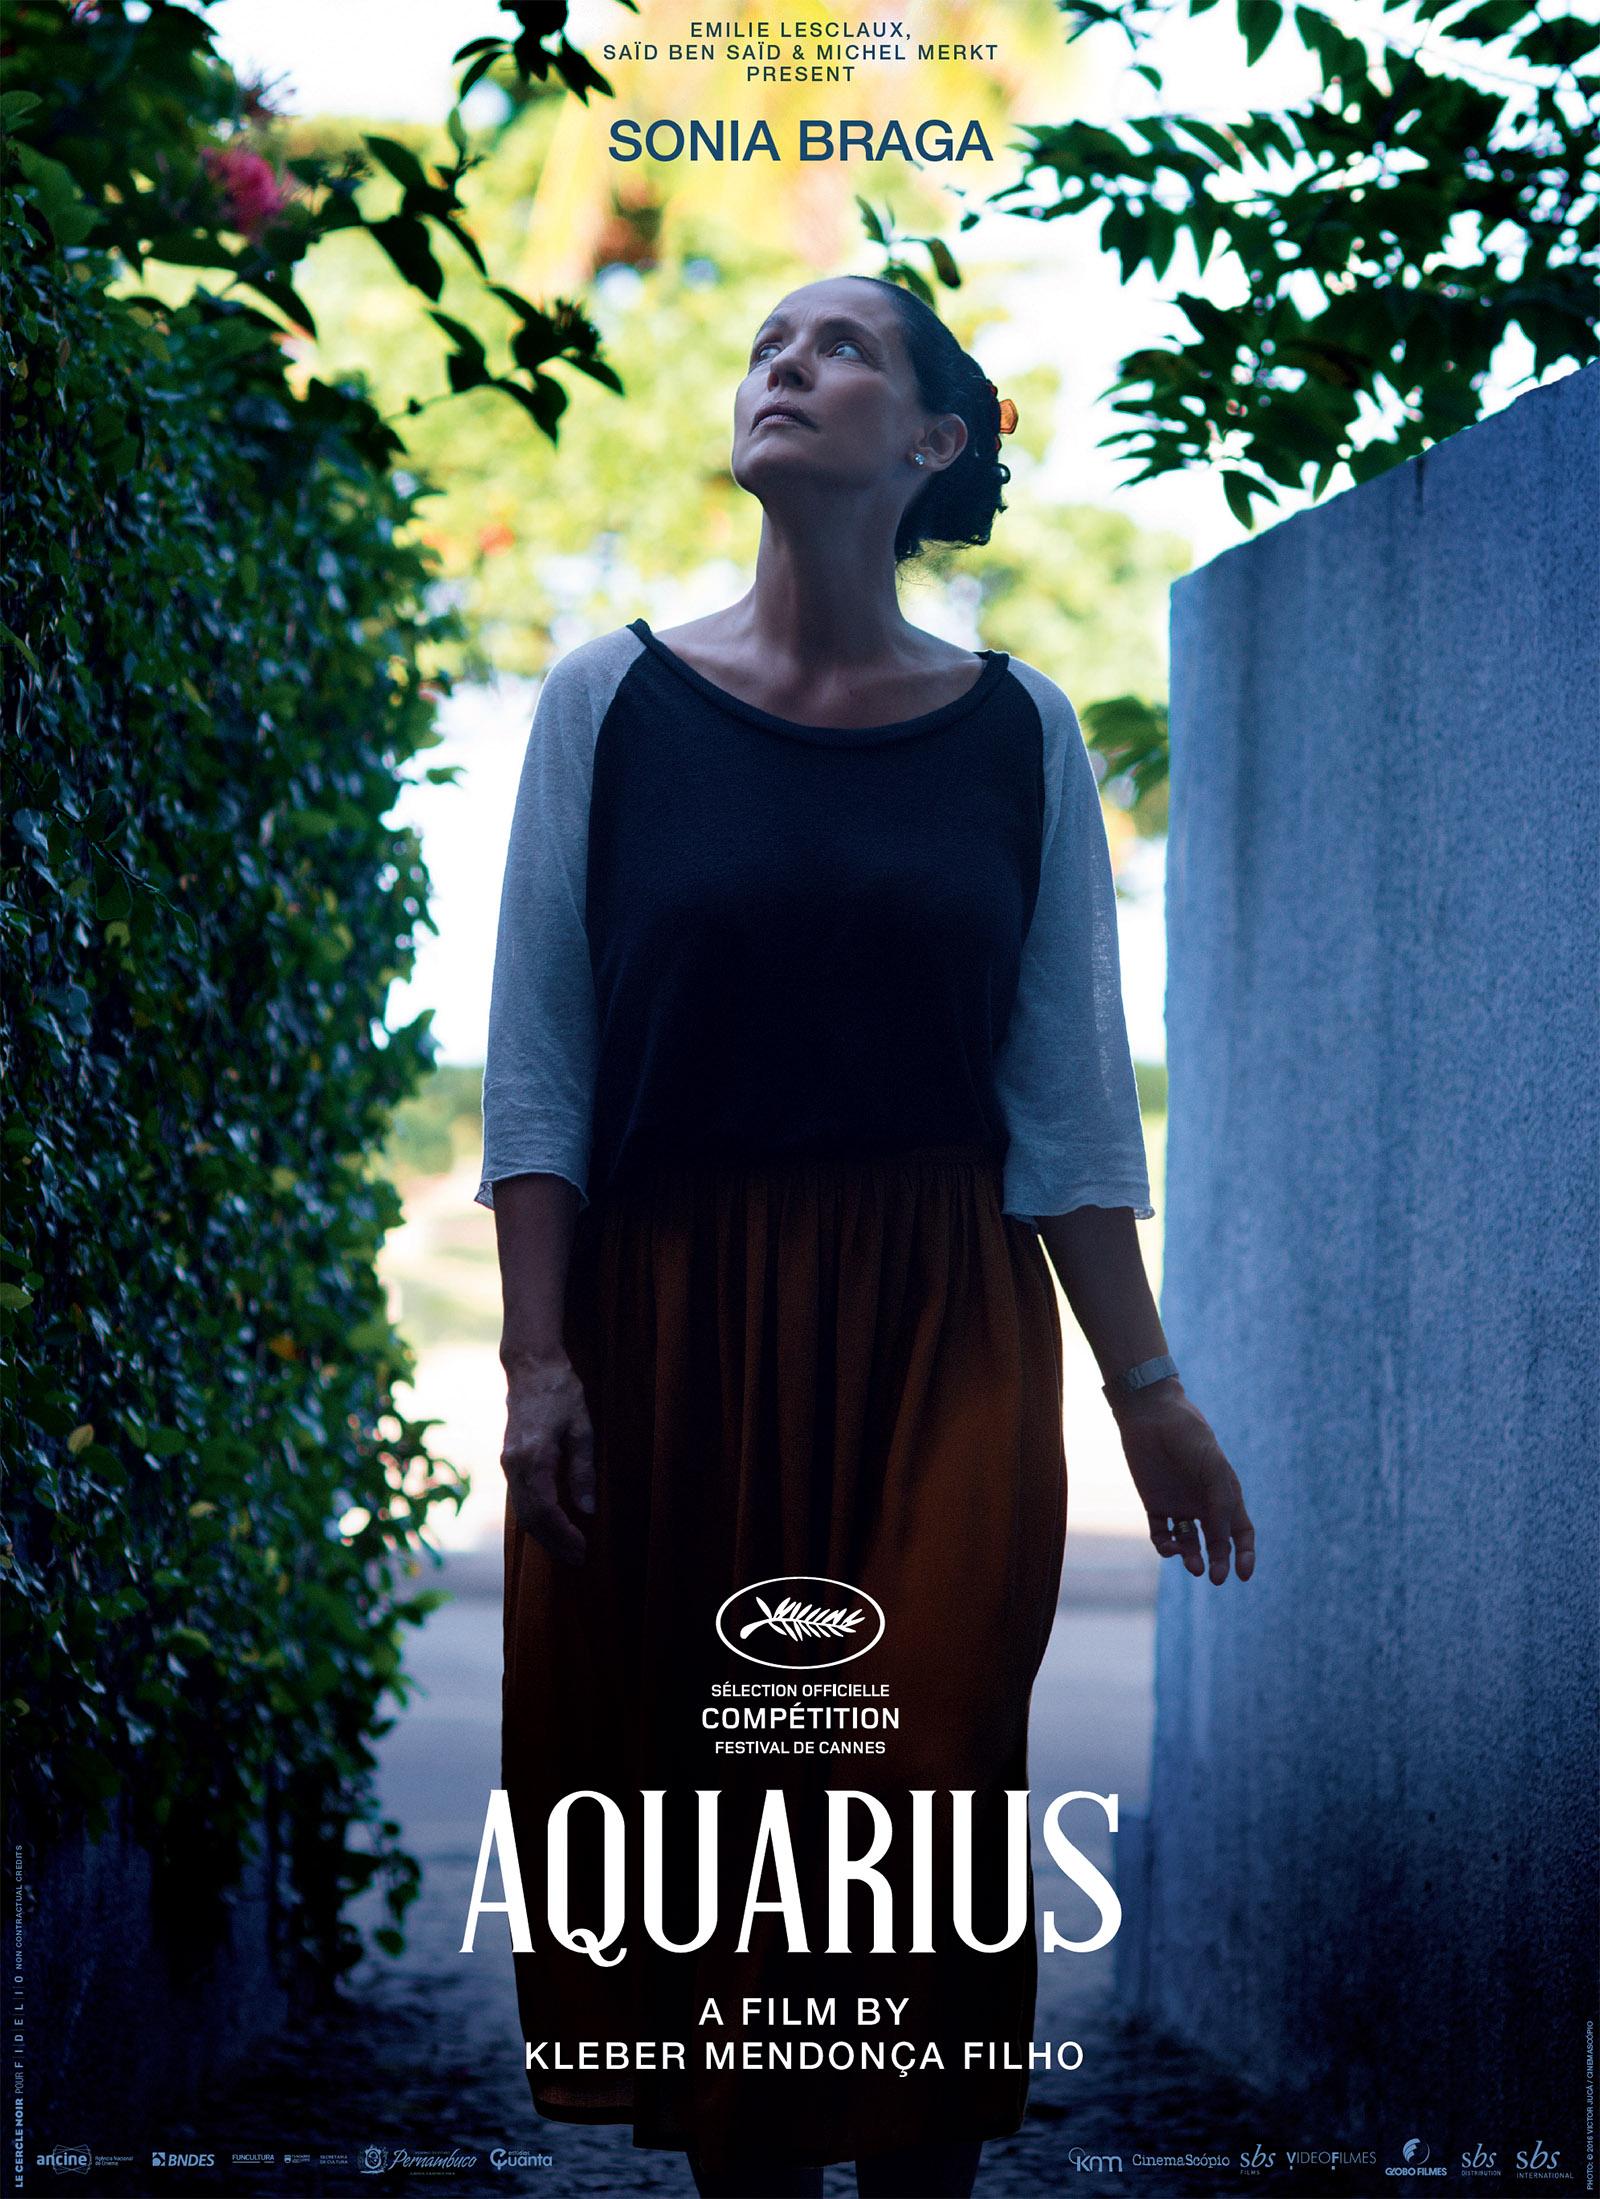 Aquarius (Brasil, 2016)